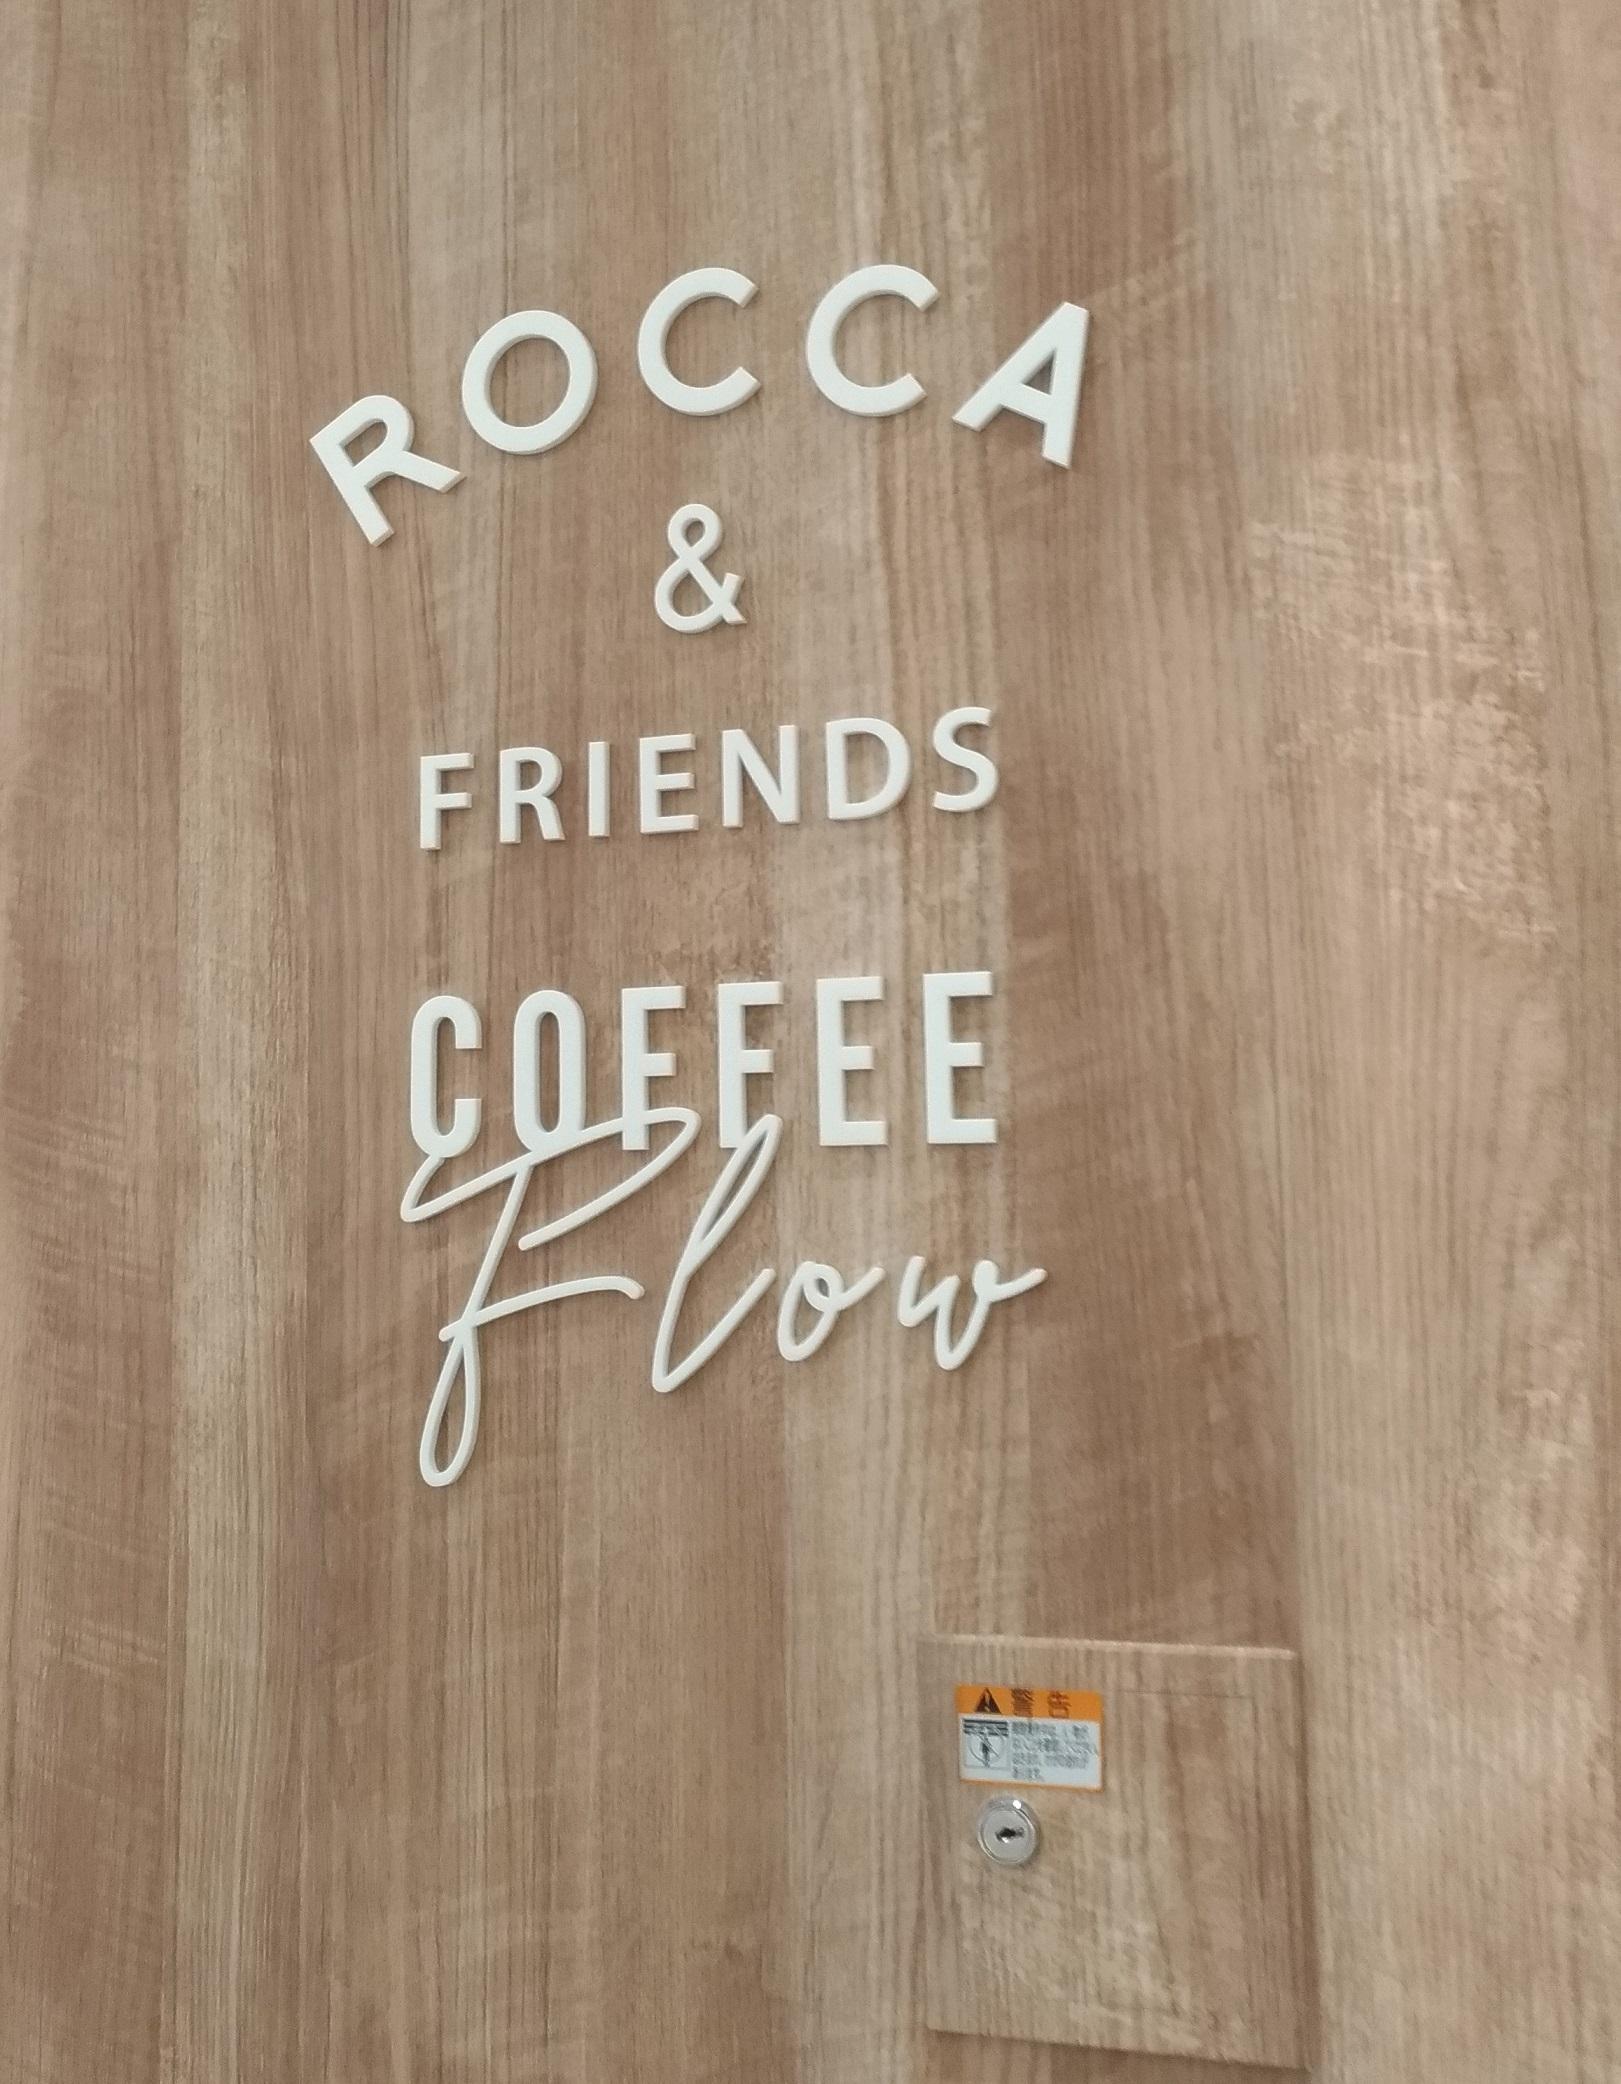 lucua_new_rocca_coffee_.jpg